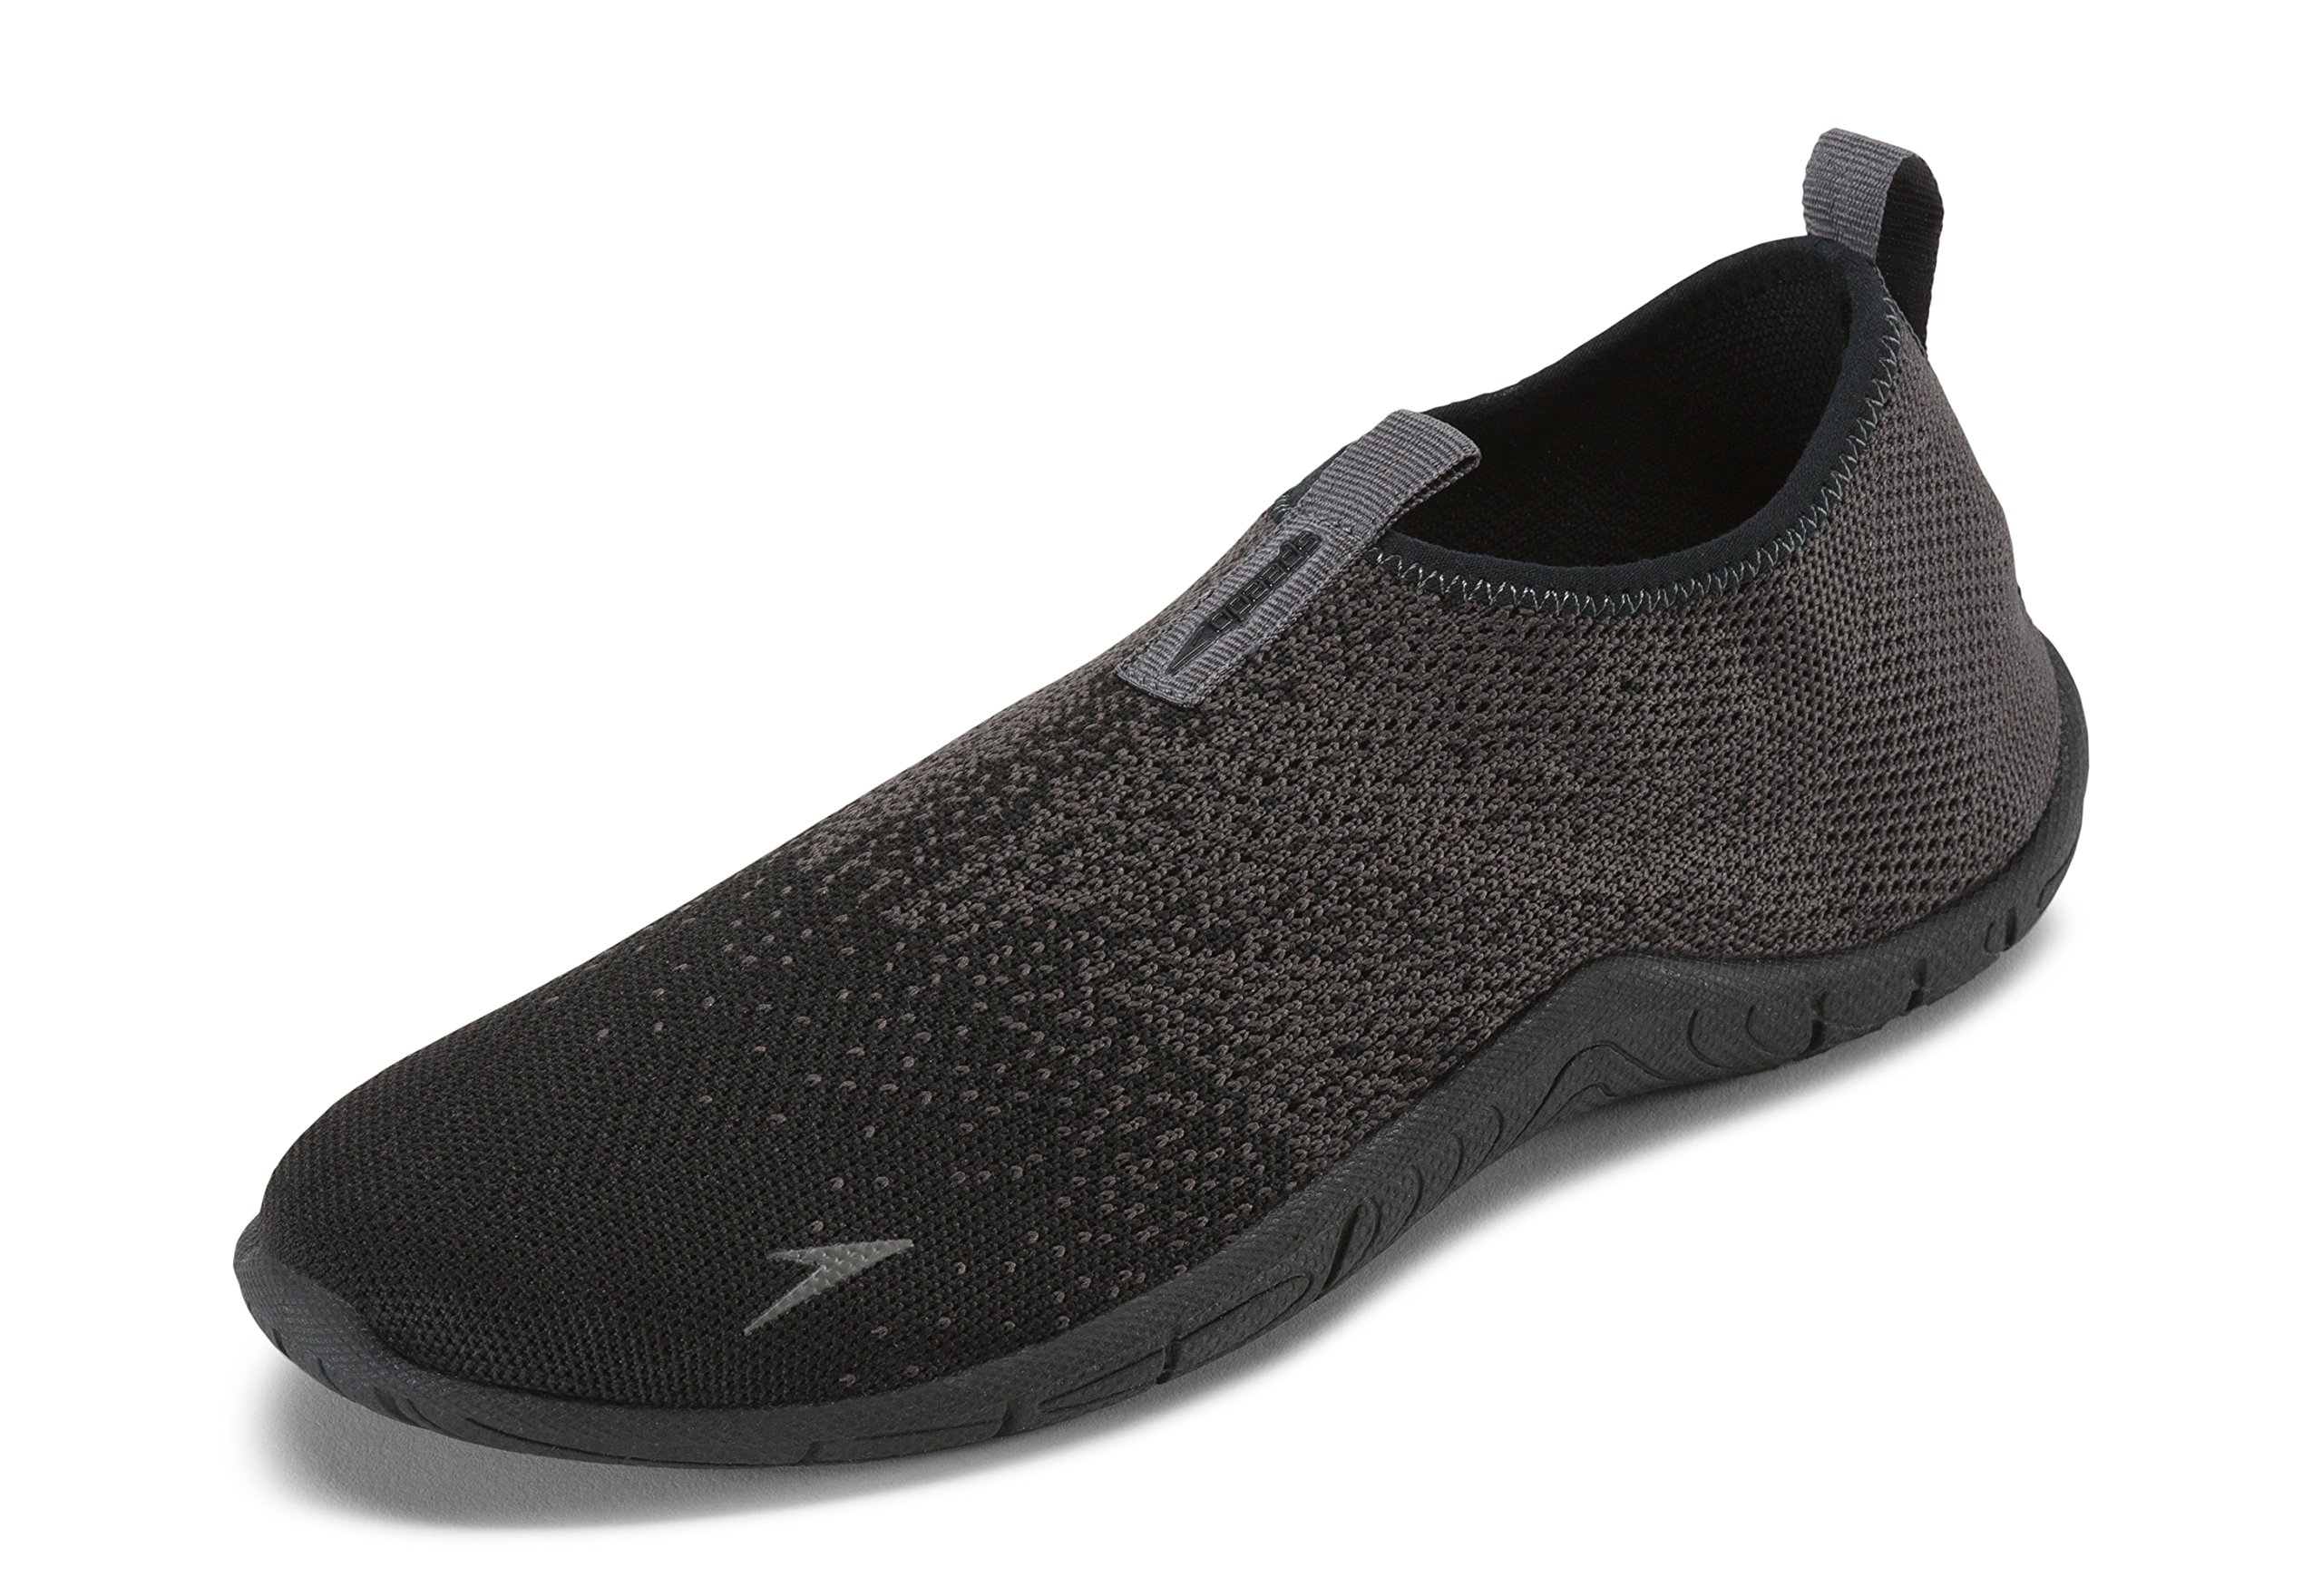 Speedo Men's Surf Knit Athletic Water Shoe, Black/Grey, 10 by Speedo